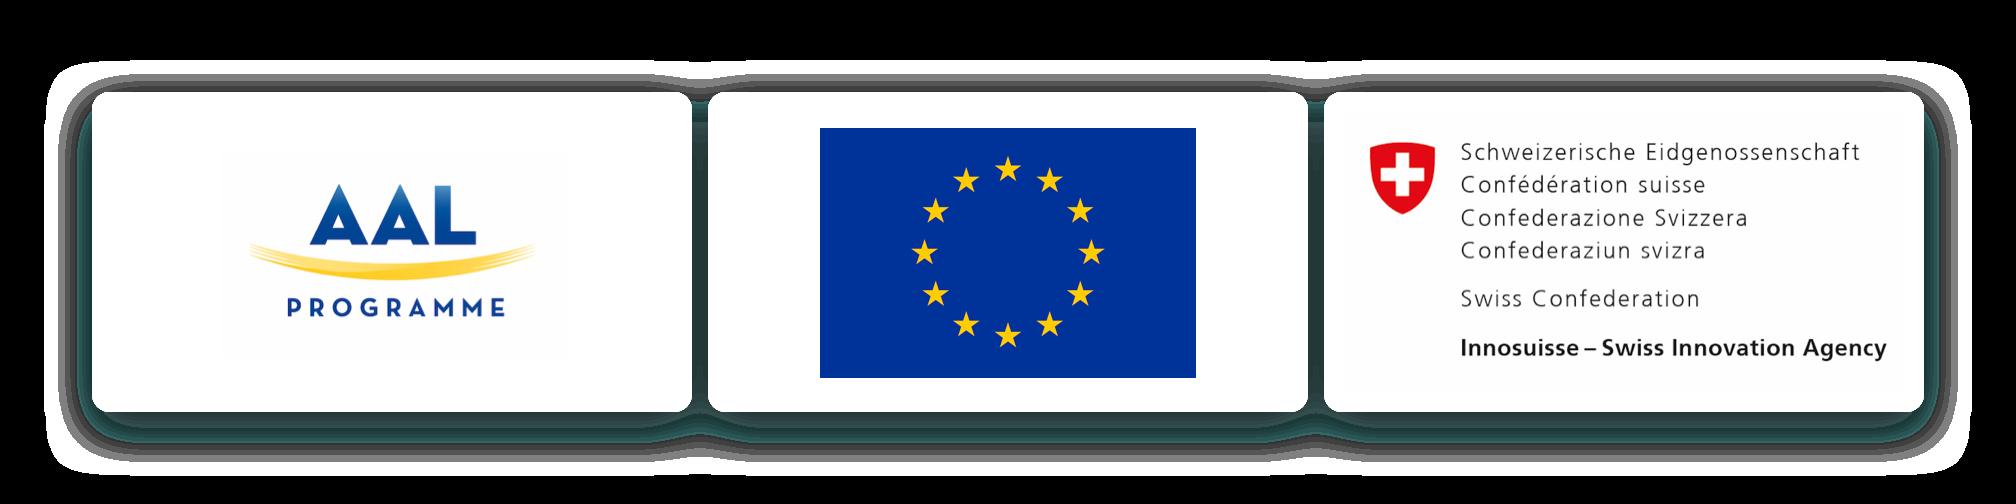 eu-aal-innosuisse-1